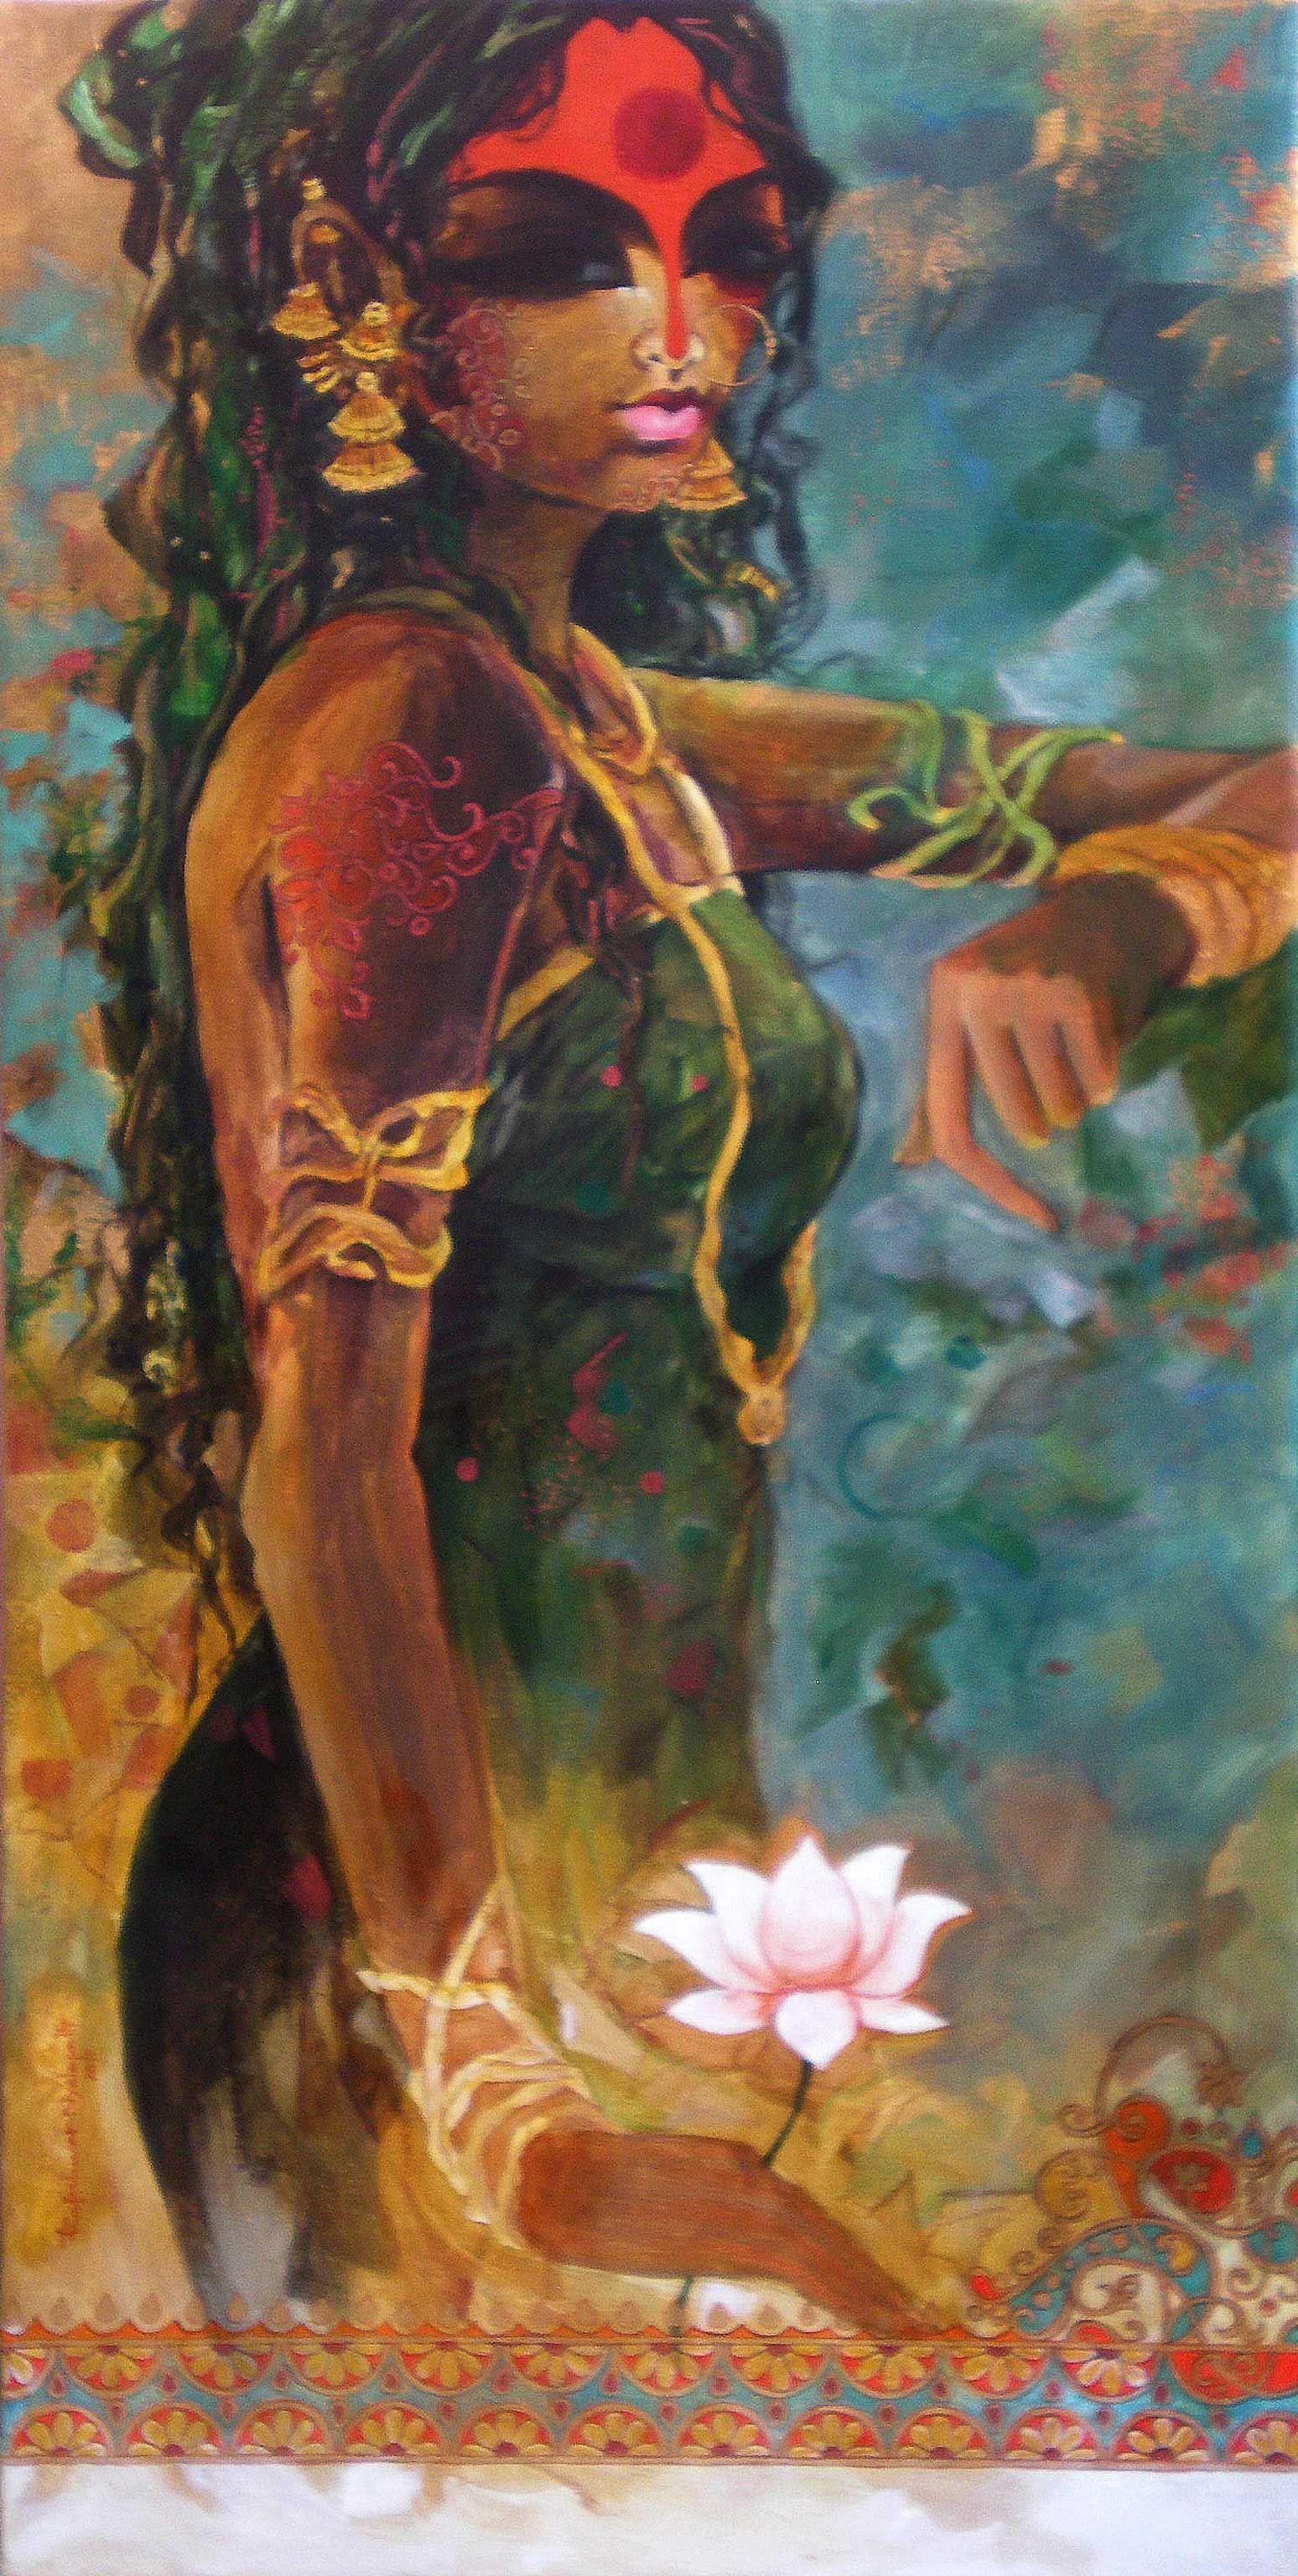 Rajeshwar Nyalapalli - 'waiting' India Art Indian